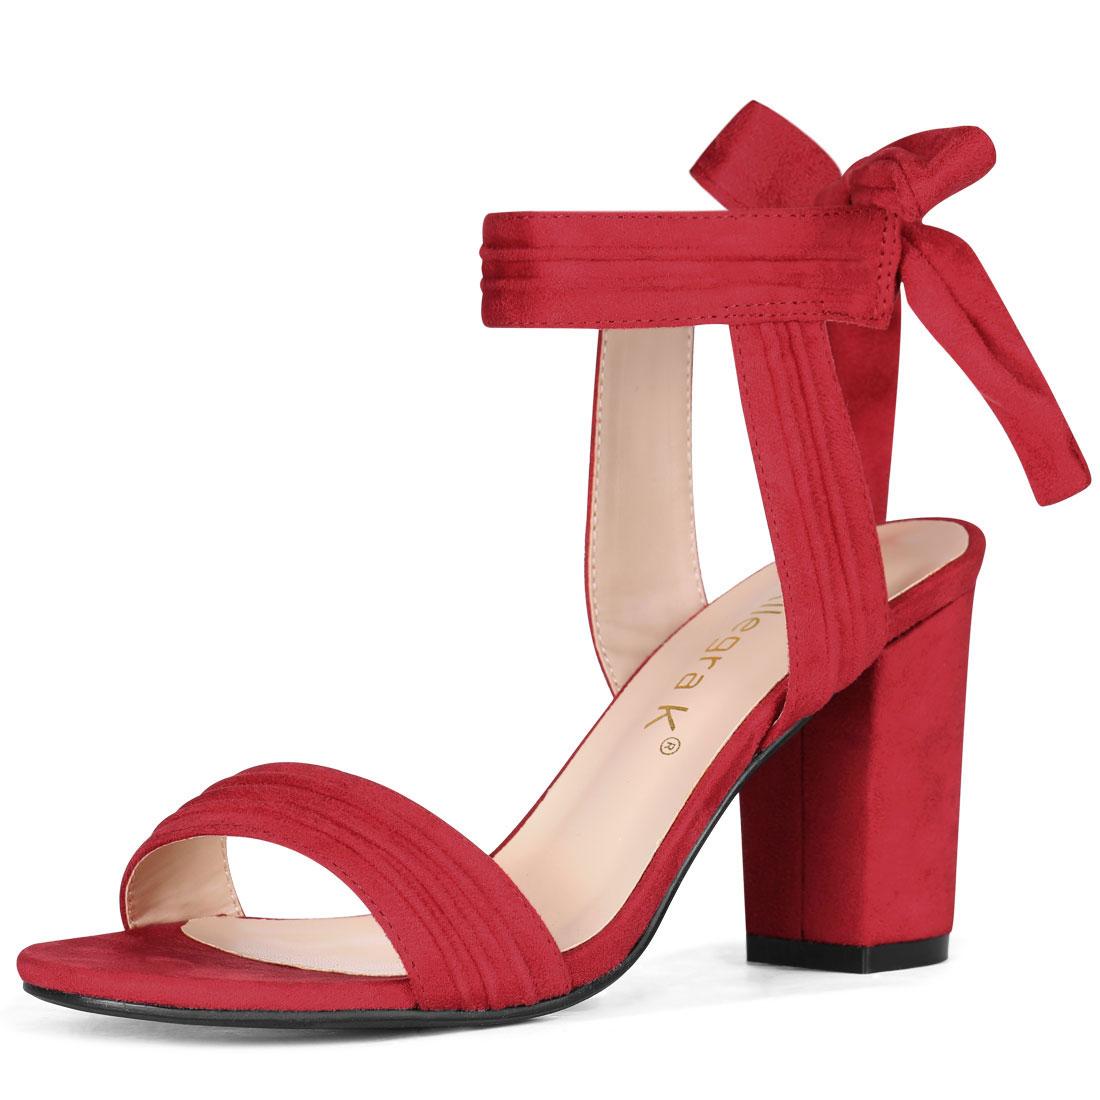 Allegra K Women's Open Toe Ankle Tie Back Chunky Heel Sandals Red US 5